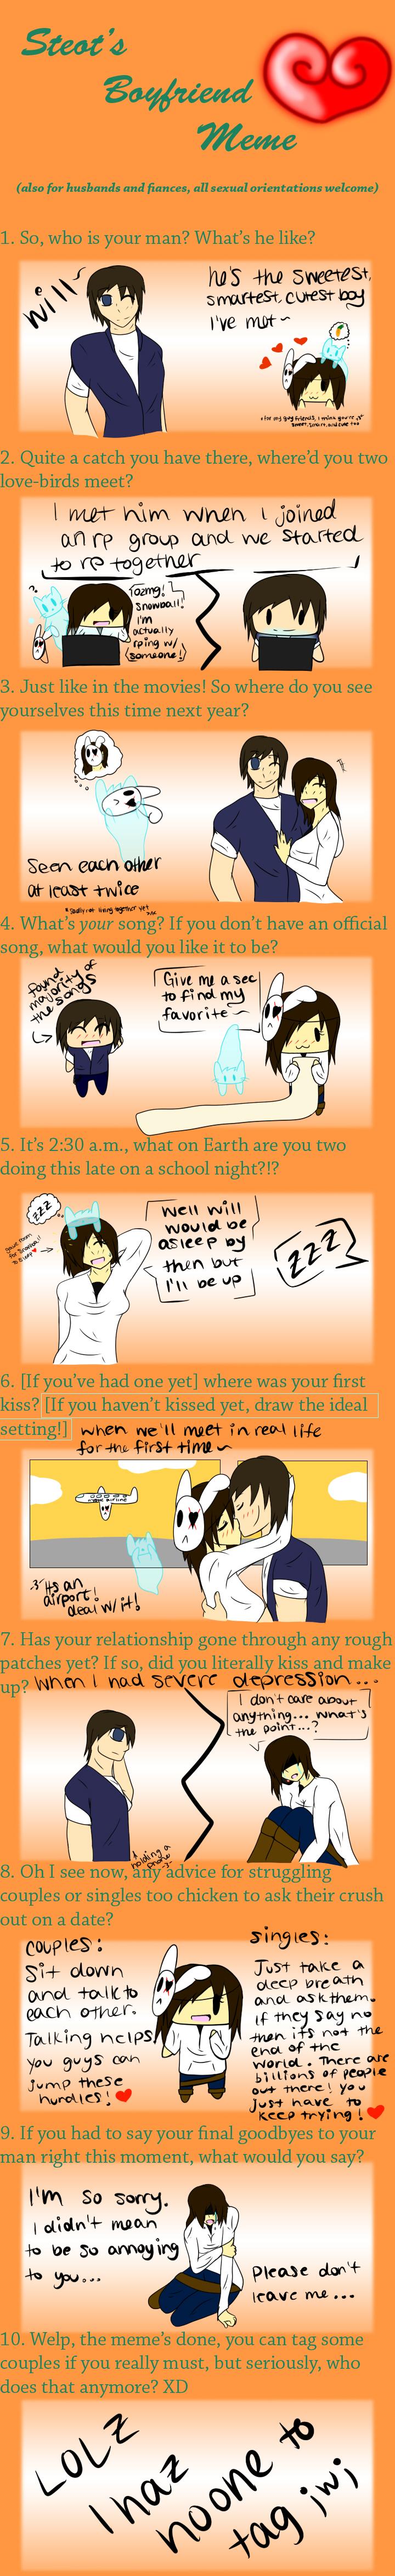 Boyfriend Meme:  by MysticAzelf on DeviantArt